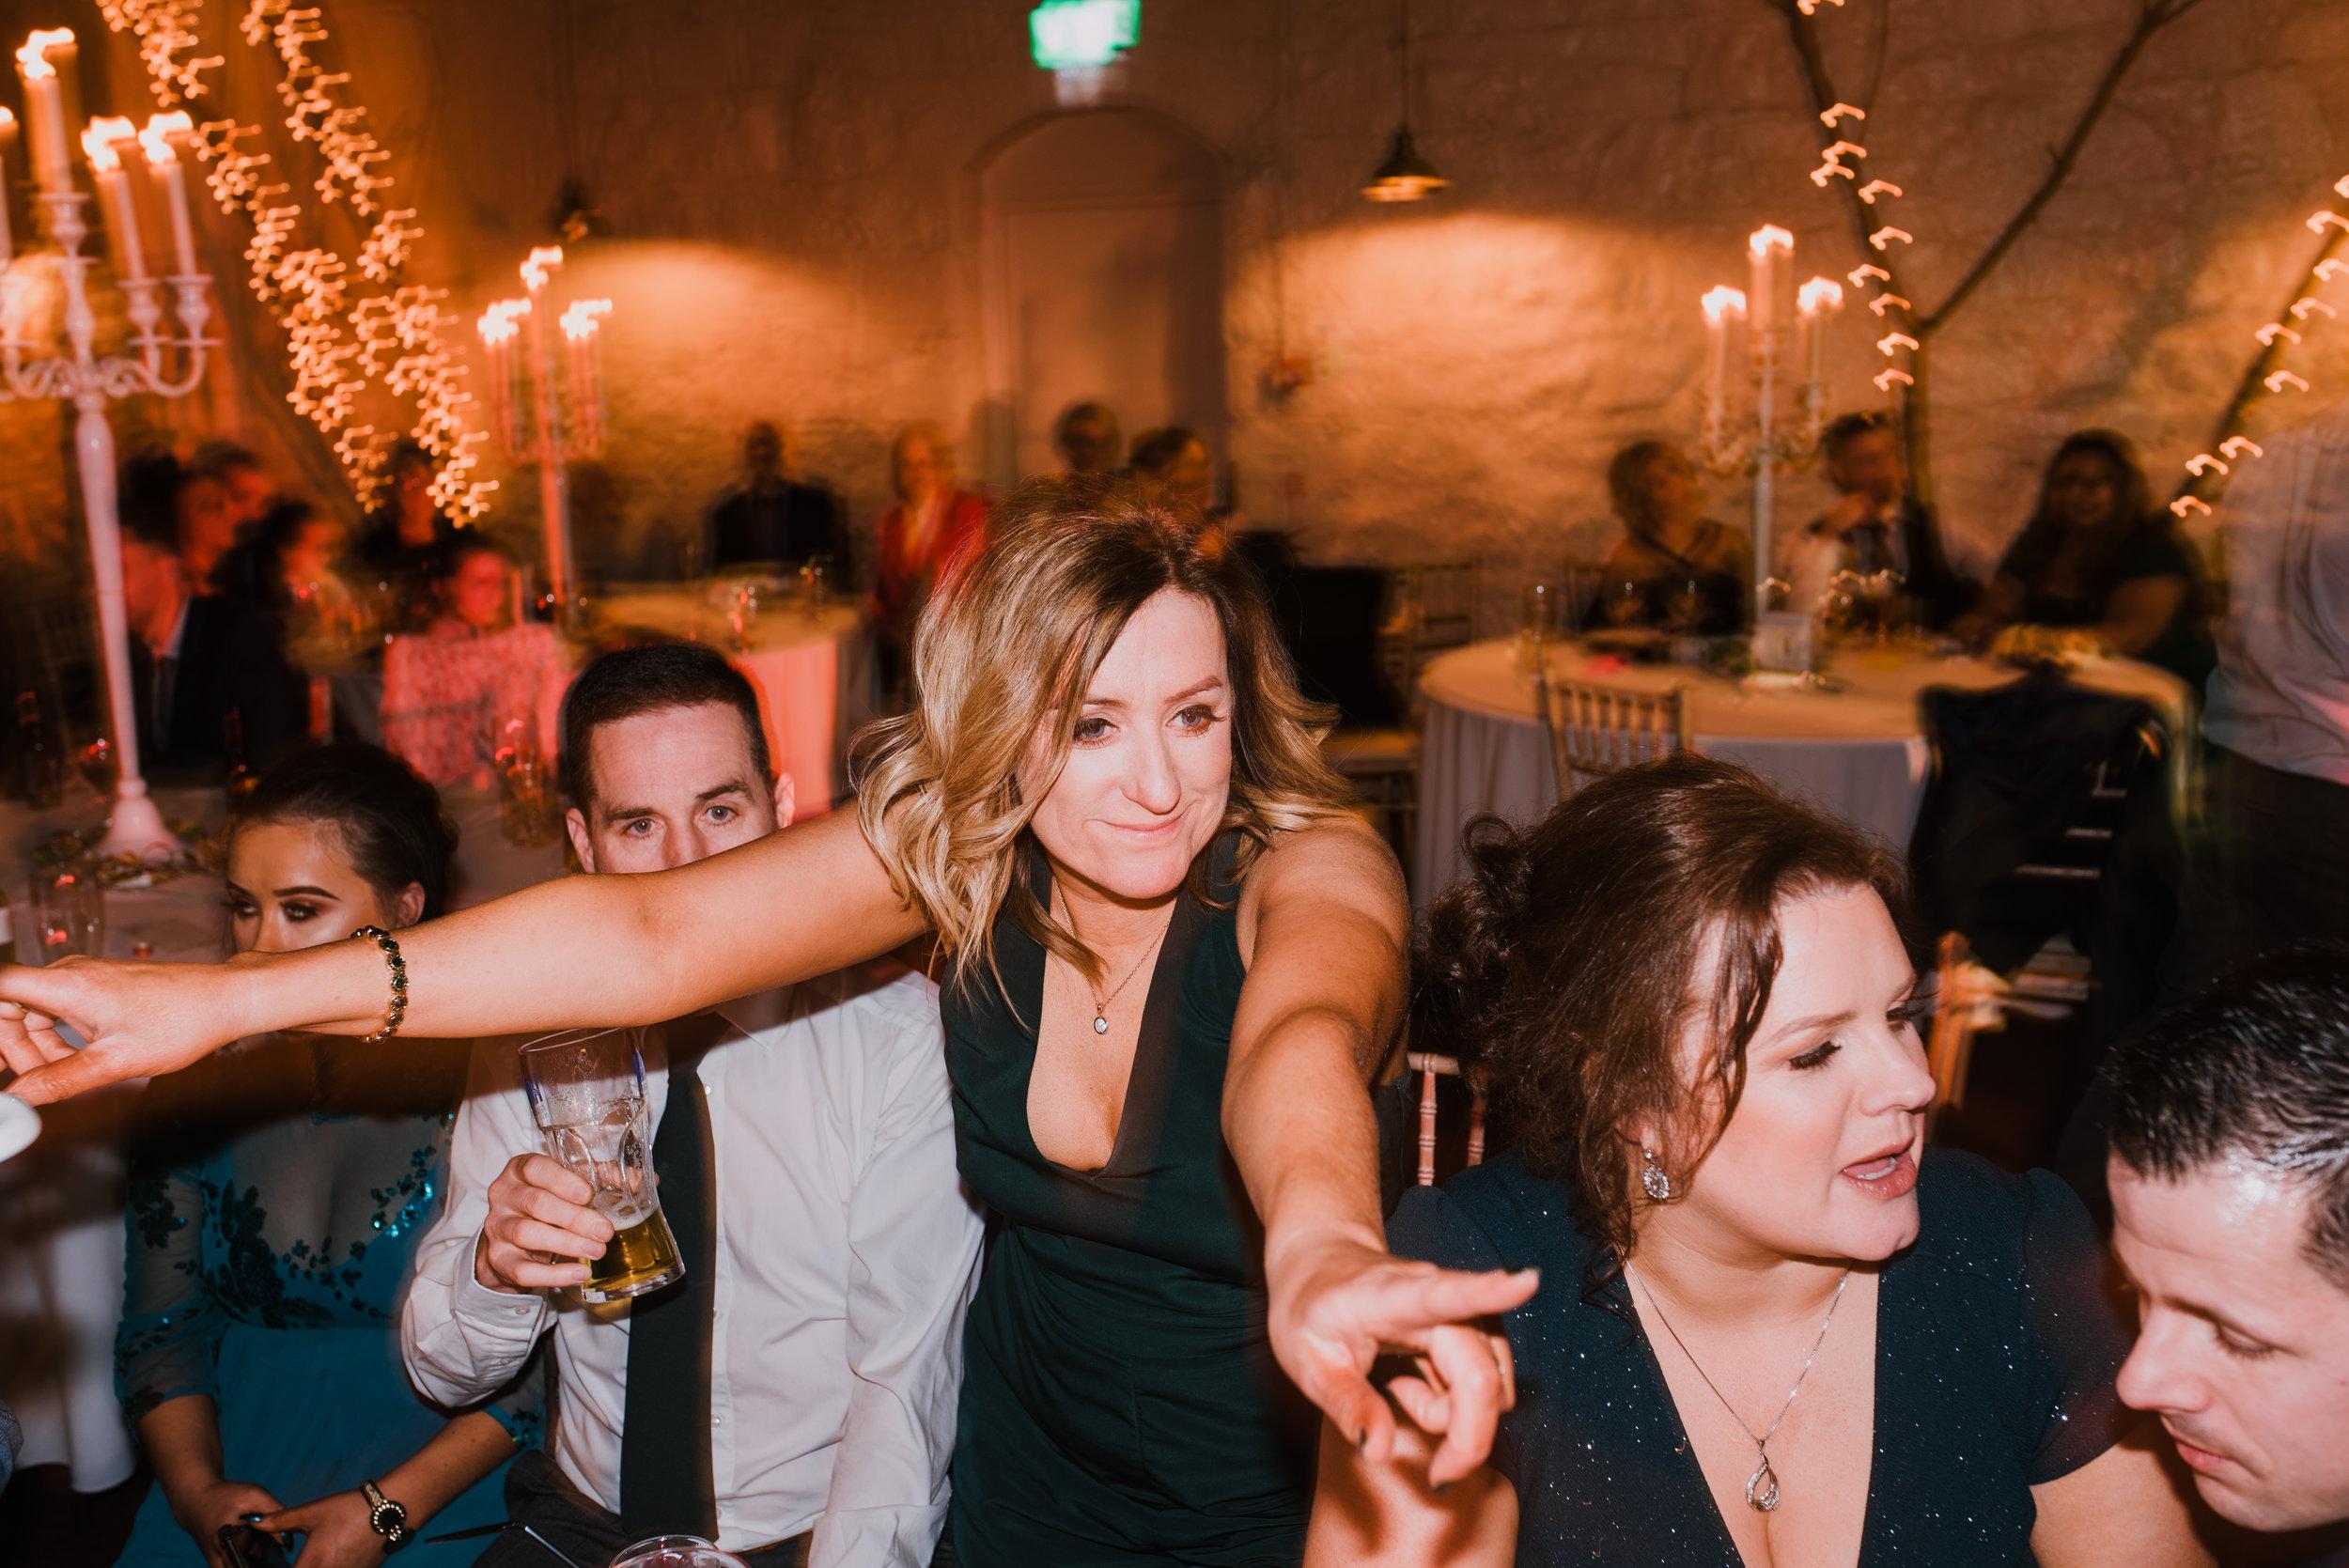 larchfield estate wedding, wedding venues northern ireland, barn wedding venues northern ireland, wedding photos larchfield estate, shane todd wedding, irish wedding, first dance (10).jpg